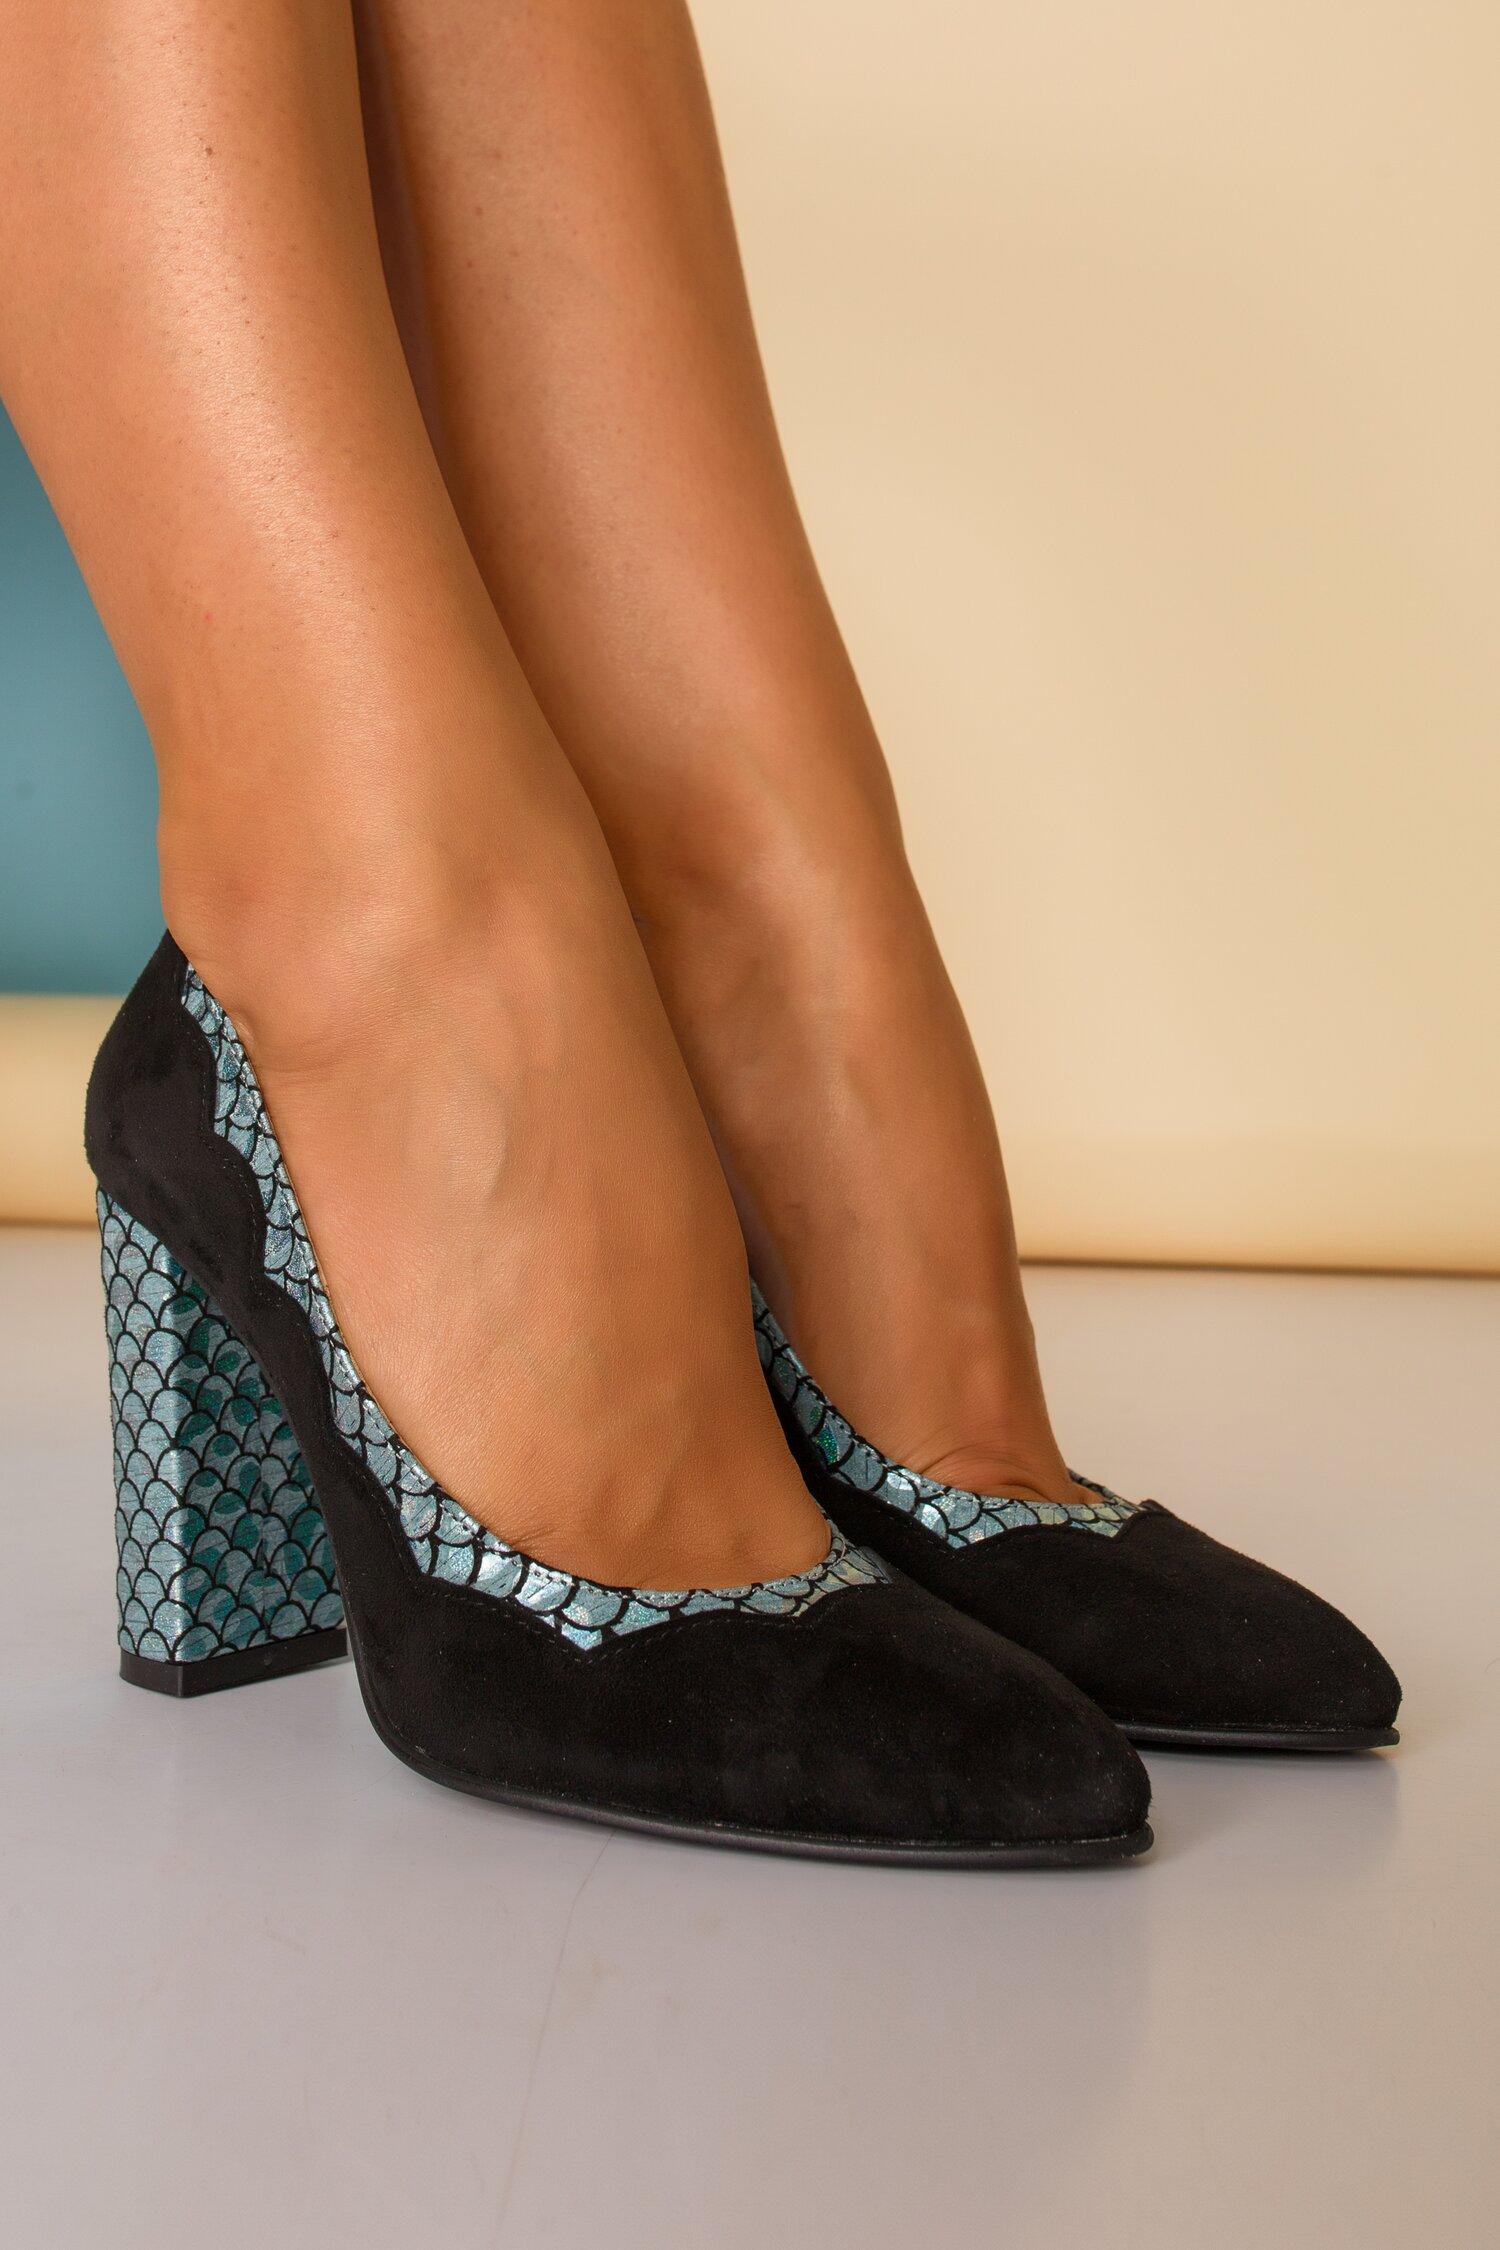 Pantofi negri eleganti cu insertii tip solzi de peste imagine